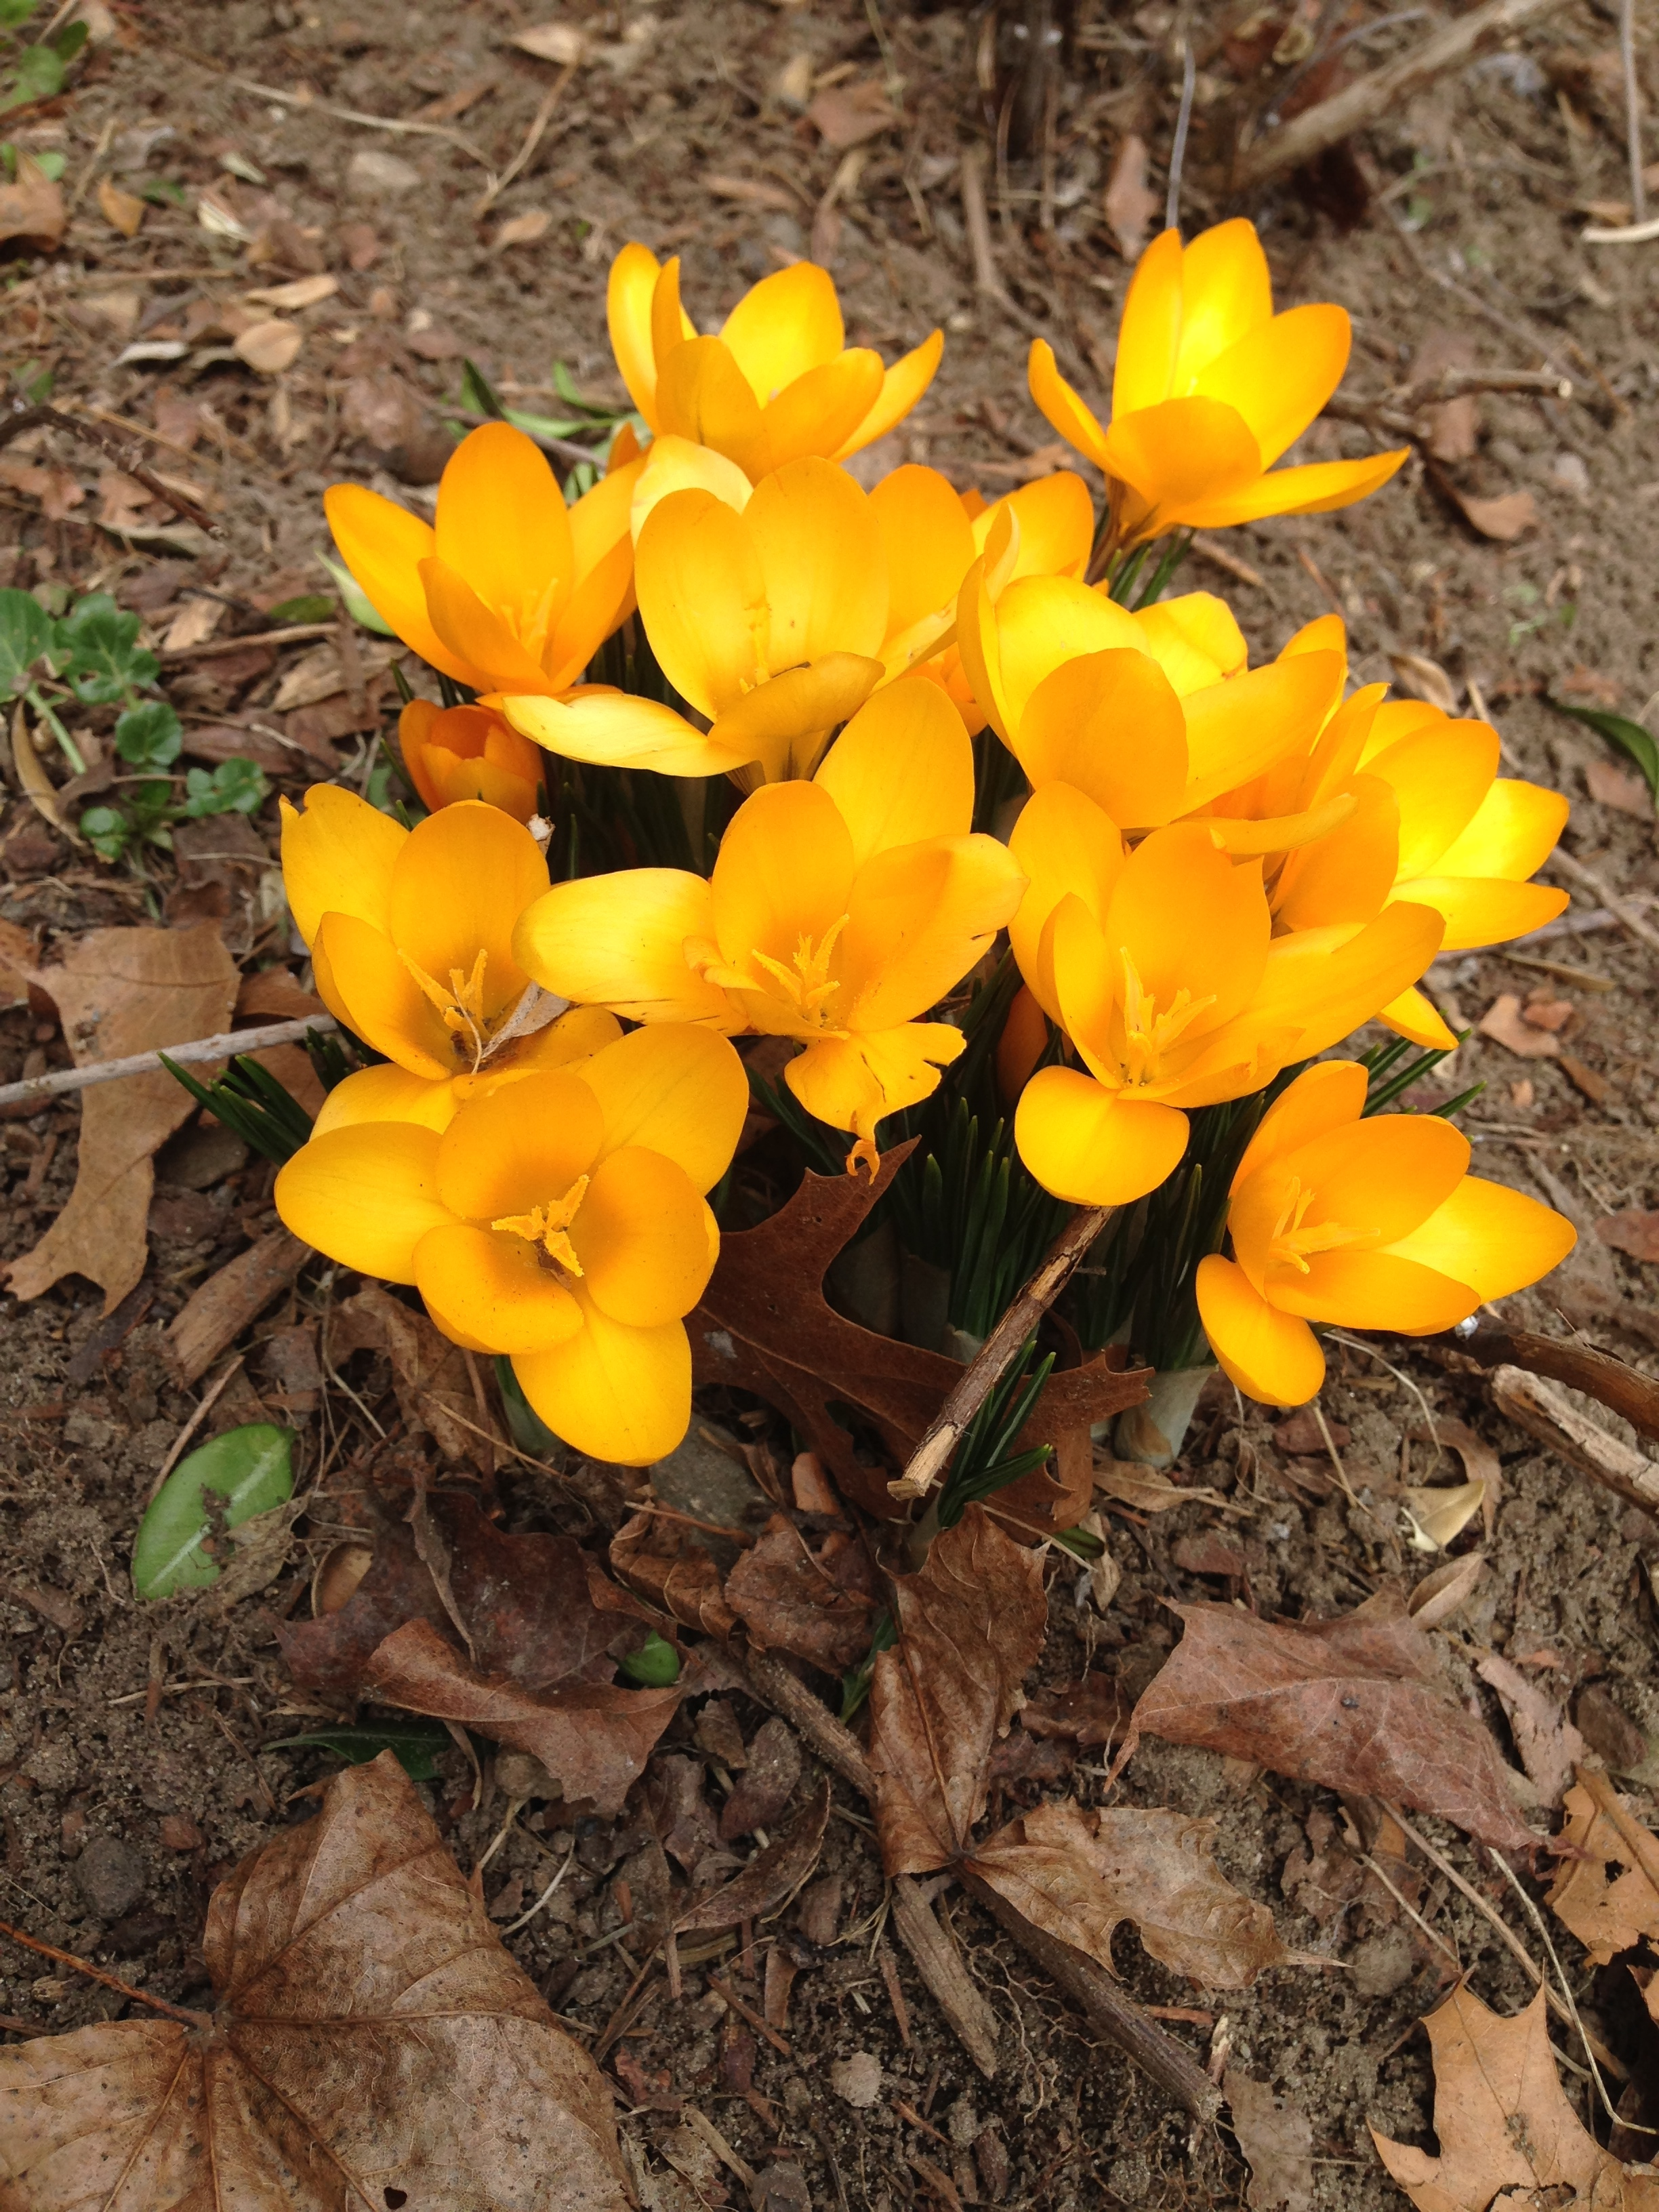 Spring Crocus Detox Cleanse Body Image